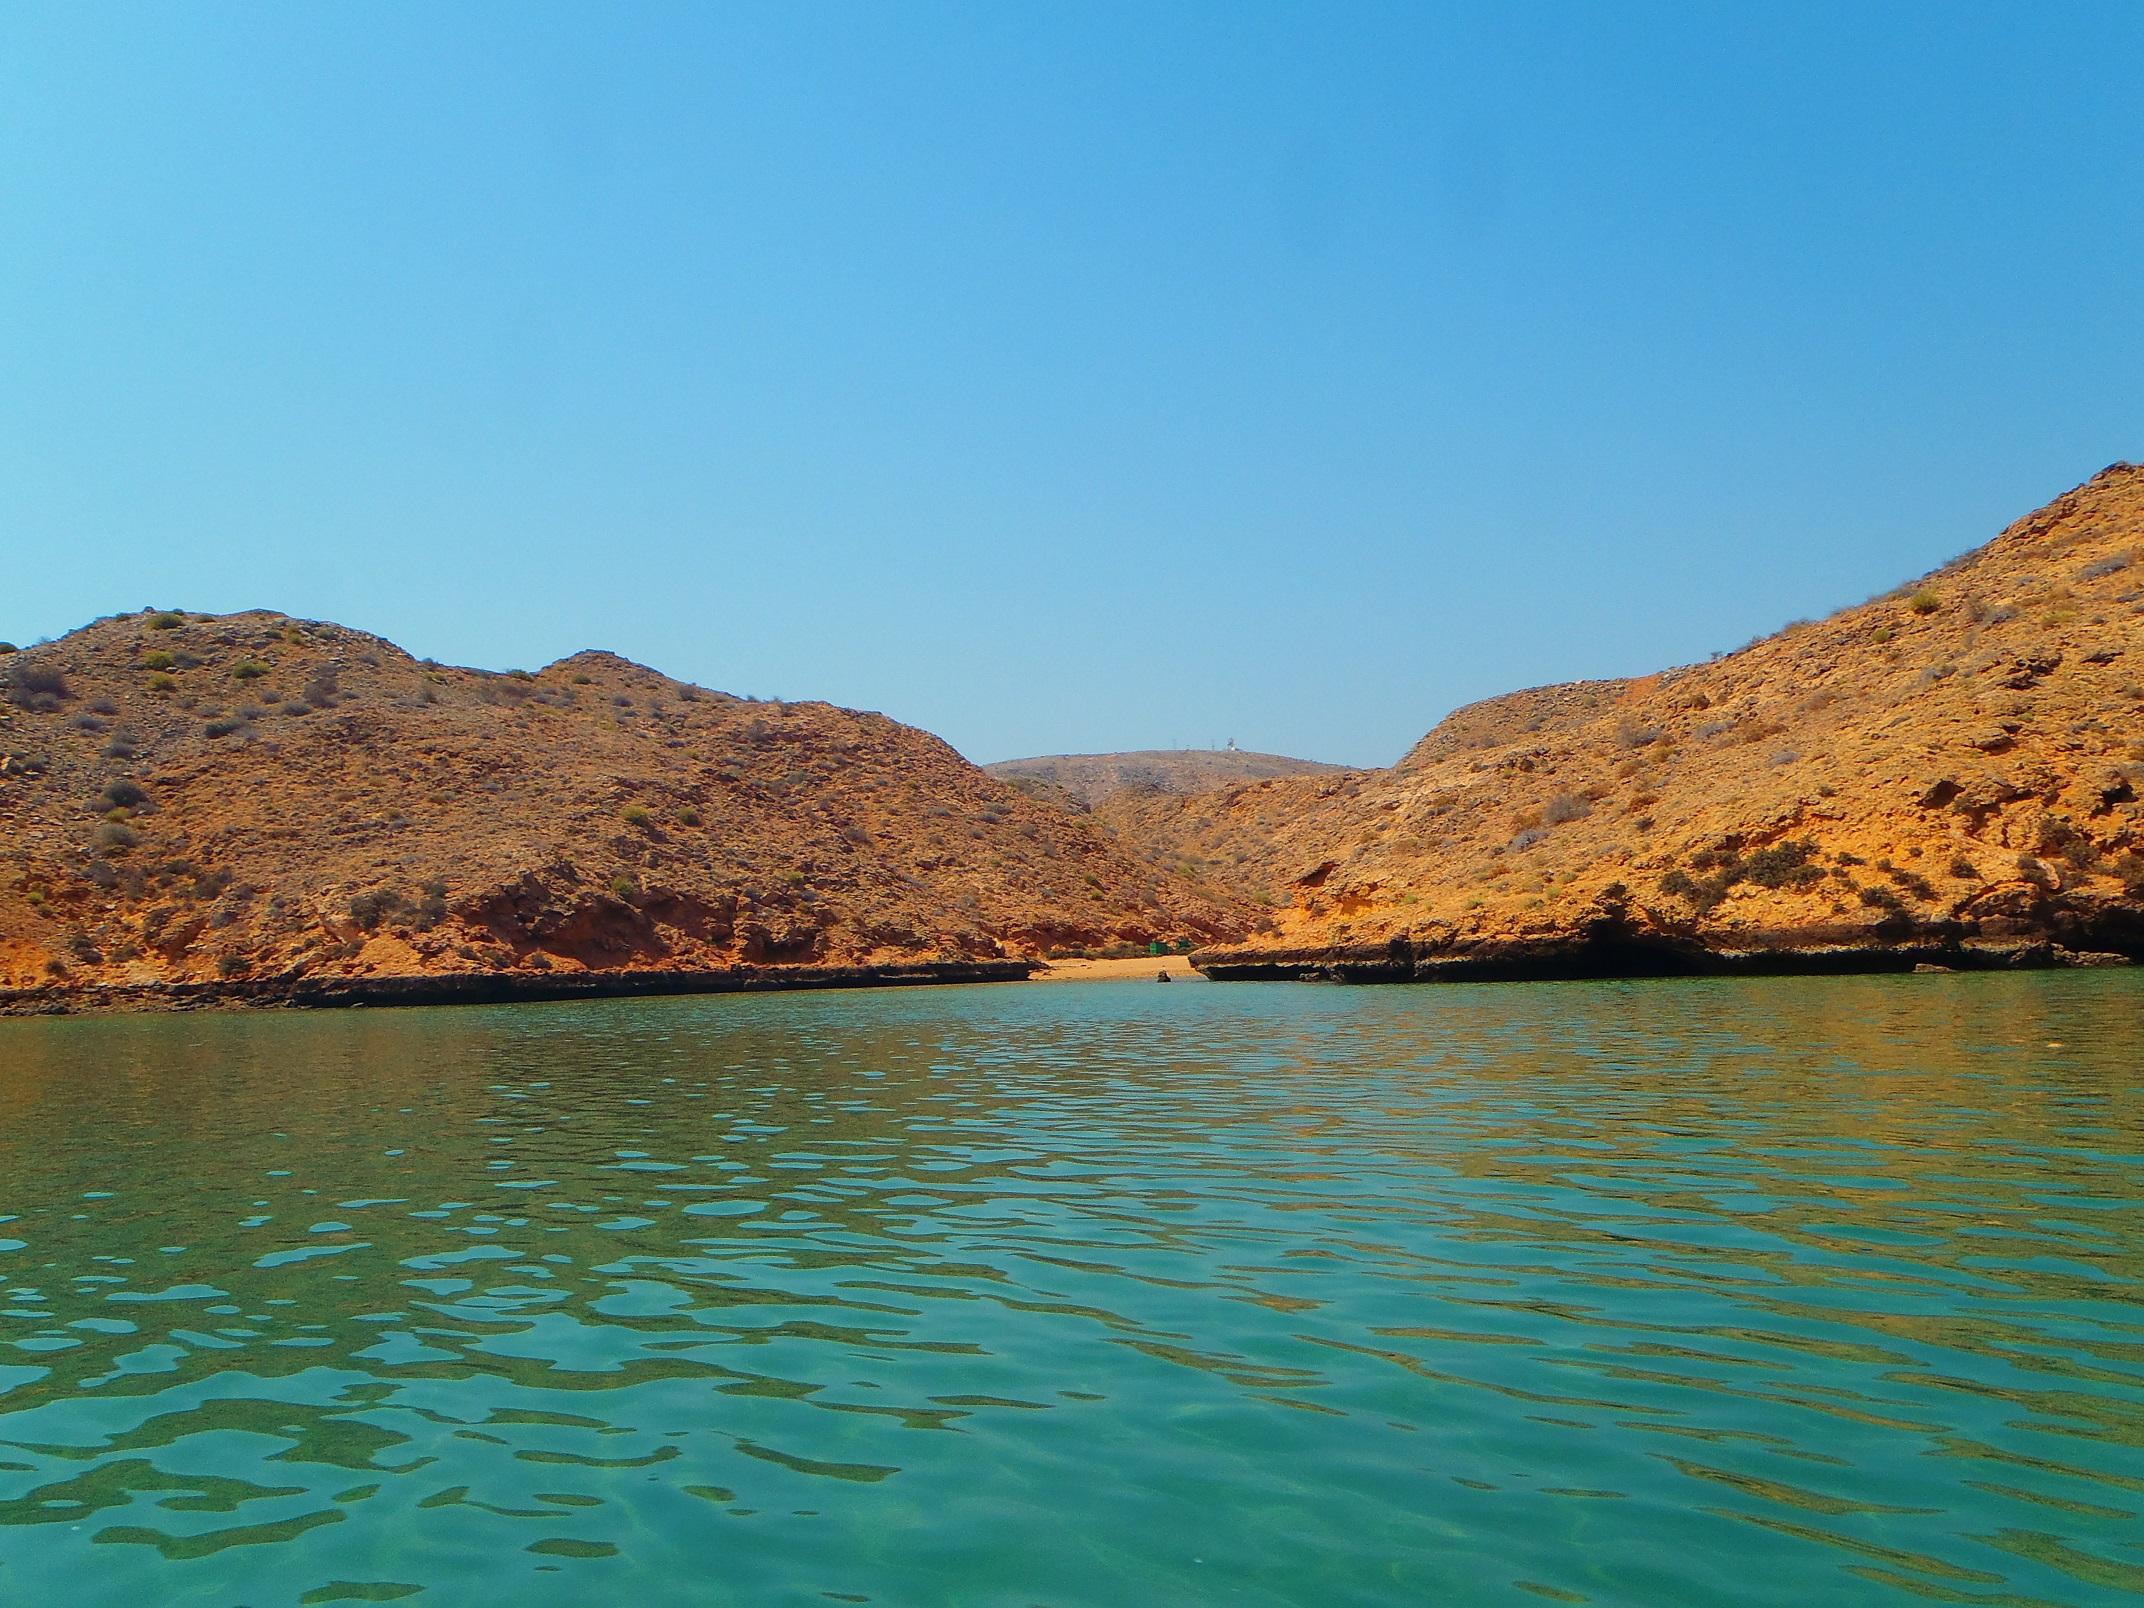 sampling site in Oman